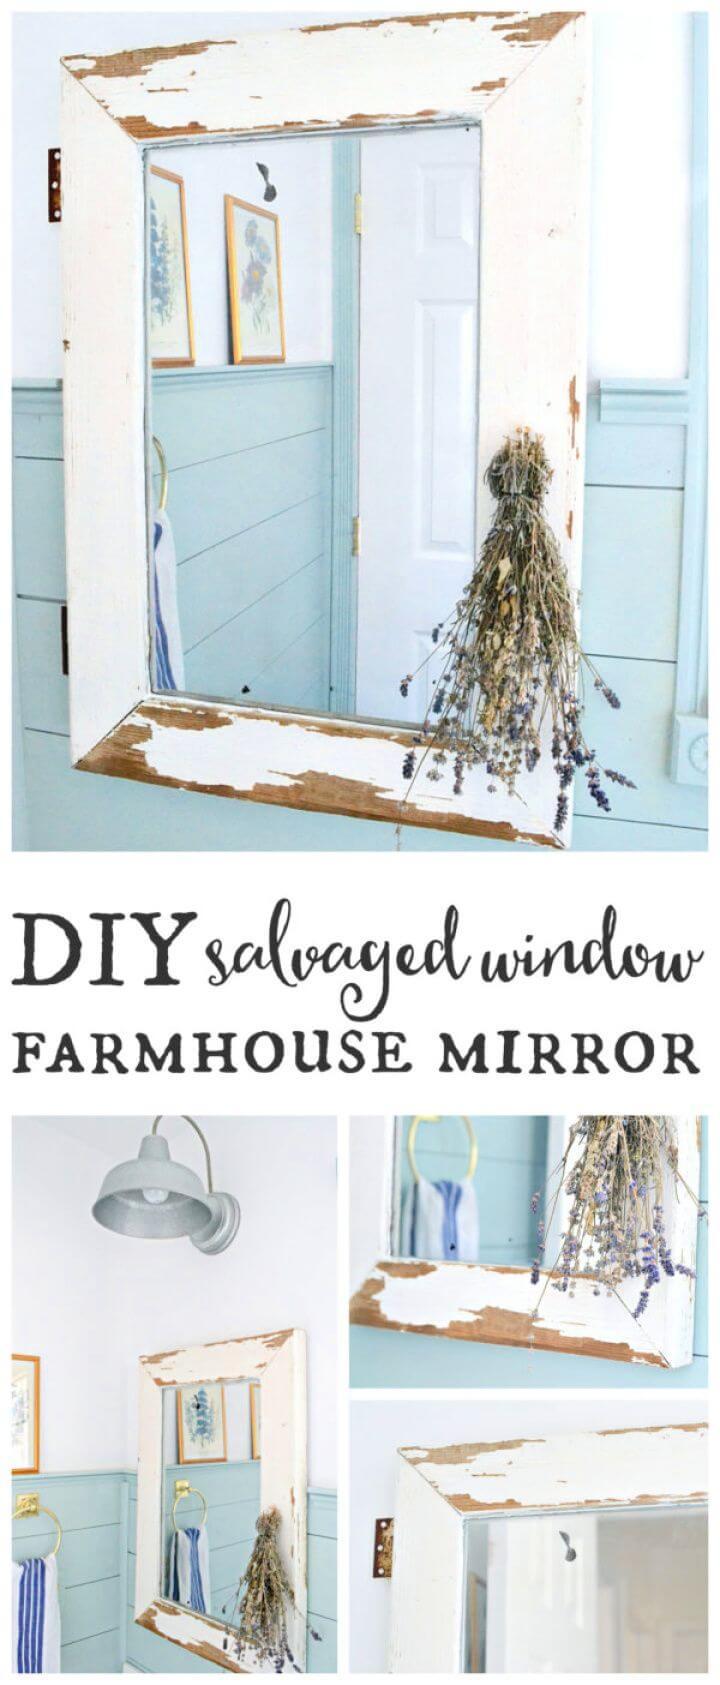 Create Your Own DIY Window Farmhouse Mirror